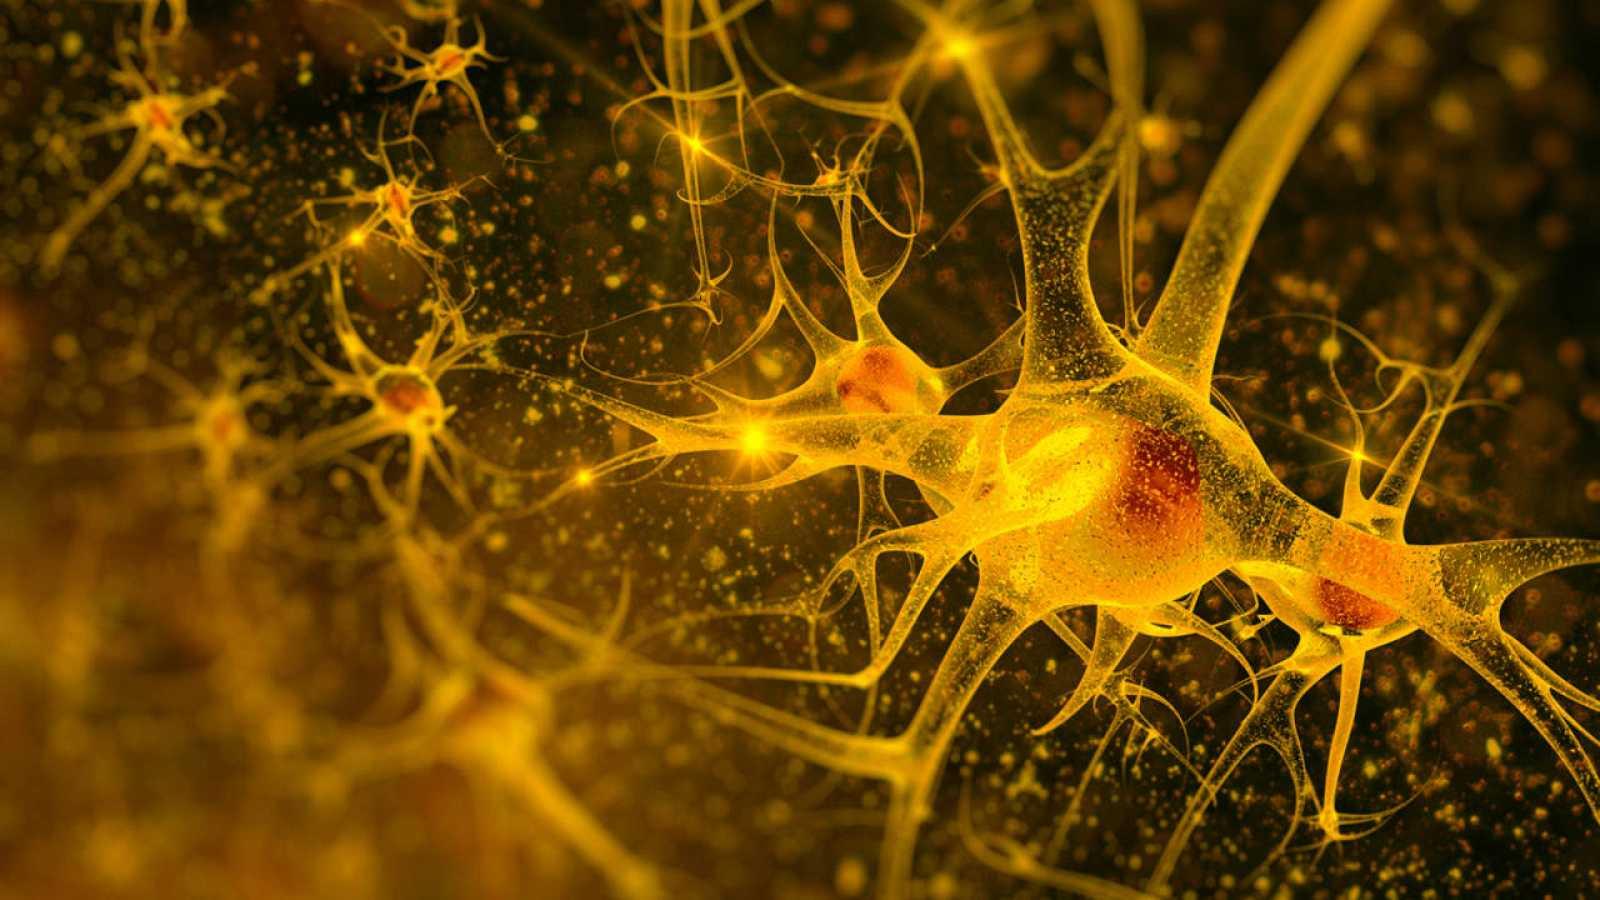 La neurogénesis es posible gracias al bloqueo de la enzima PDE7